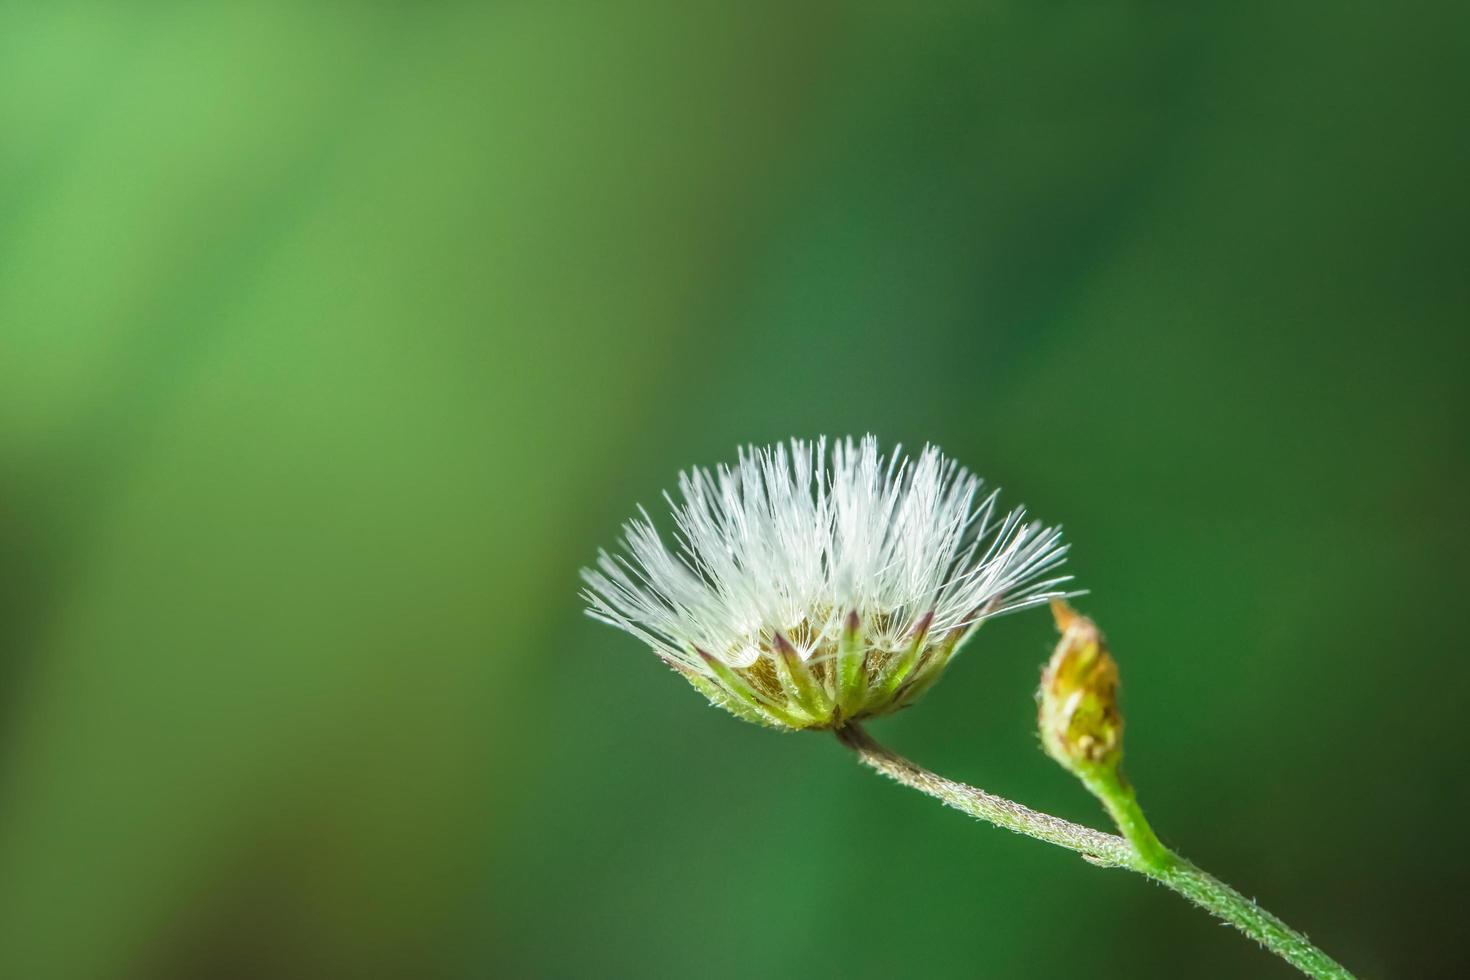 Wildblumen-Nahaufnahmefoto foto